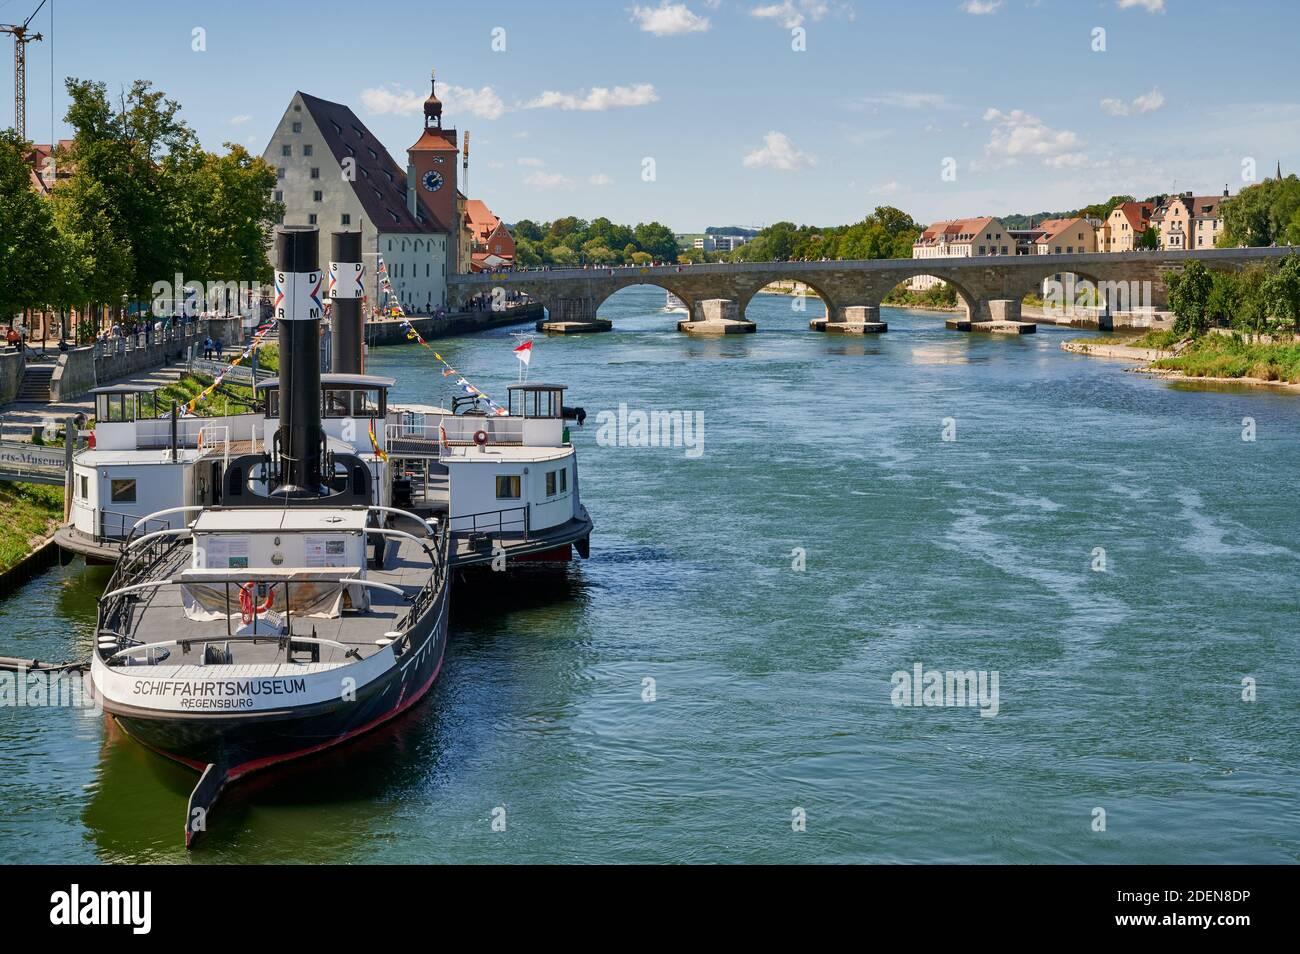 RUTHOF / ÉRSEKCSANÁD Ship Museum on River Danube and Steinerne Bruecke behind, Regensburg , Bavaria, Germany Stock Photo